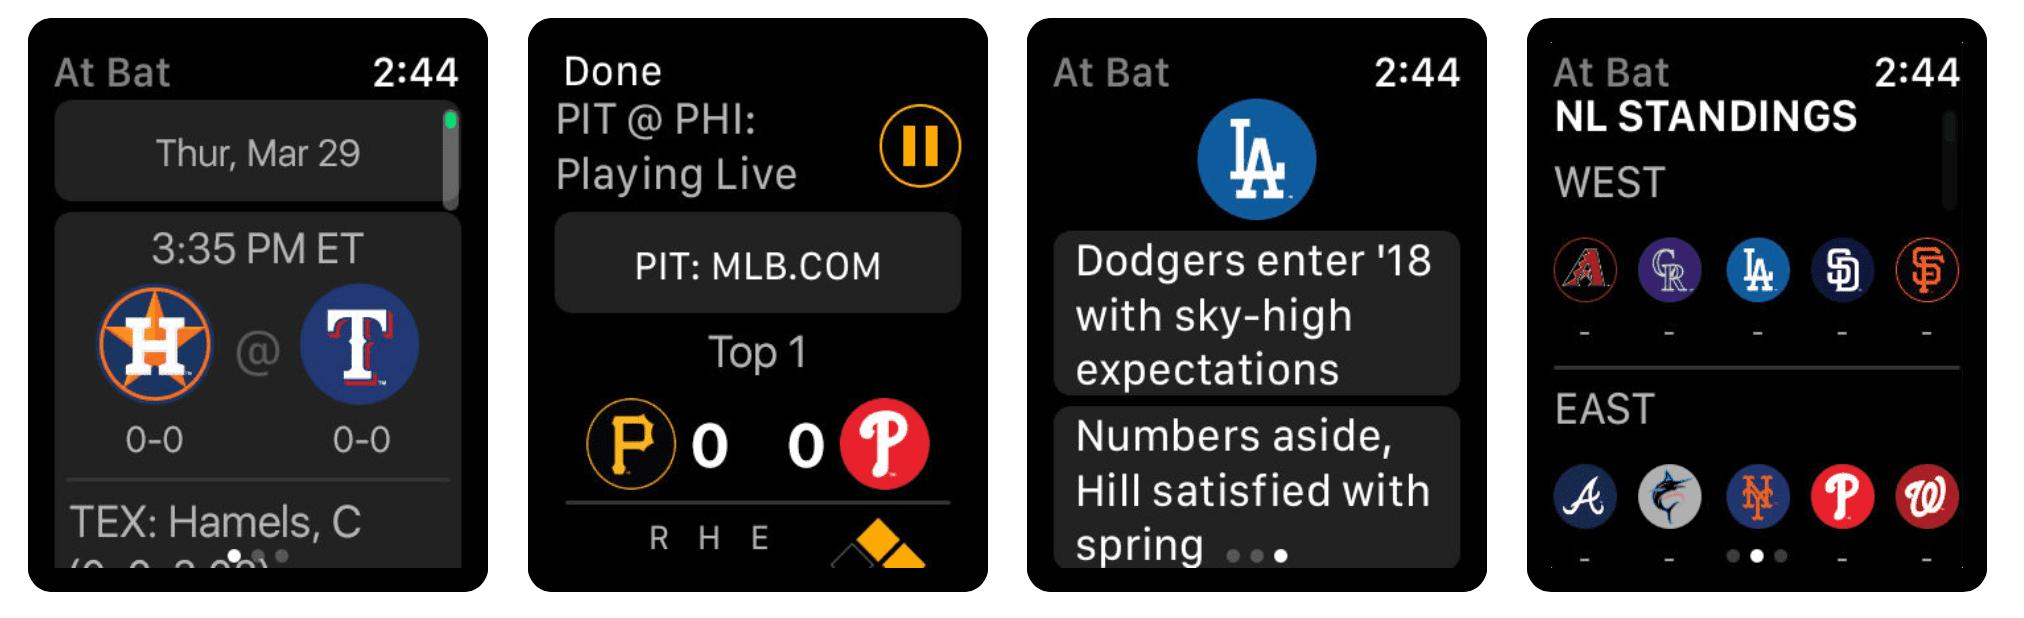 MLB At Bat Apple Watch Complication